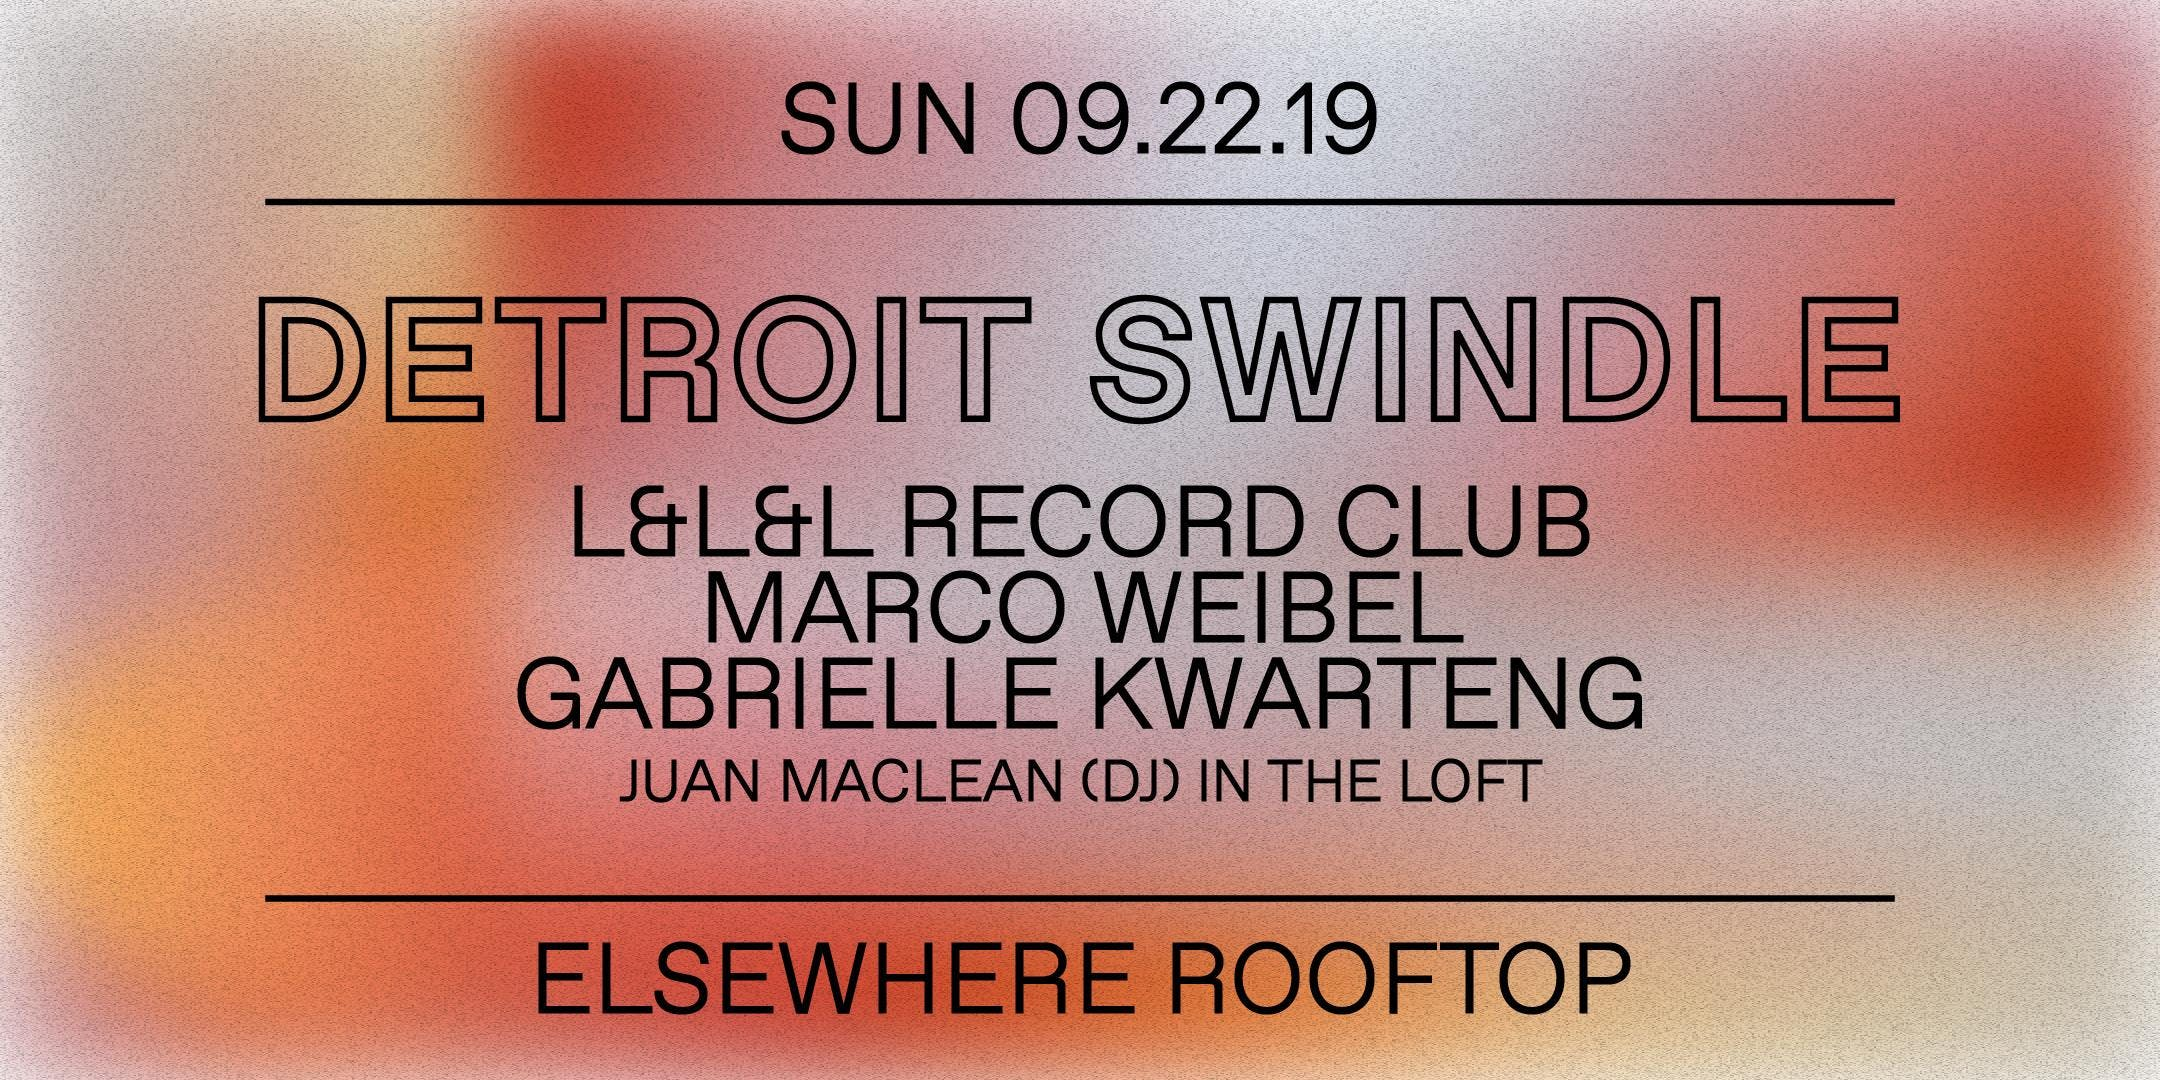 Detroit Swindle, L&L&L Record Club, Marco Weibel, Gabrielle Kwarteng & Juan MacLean (DJ Set) in Loft